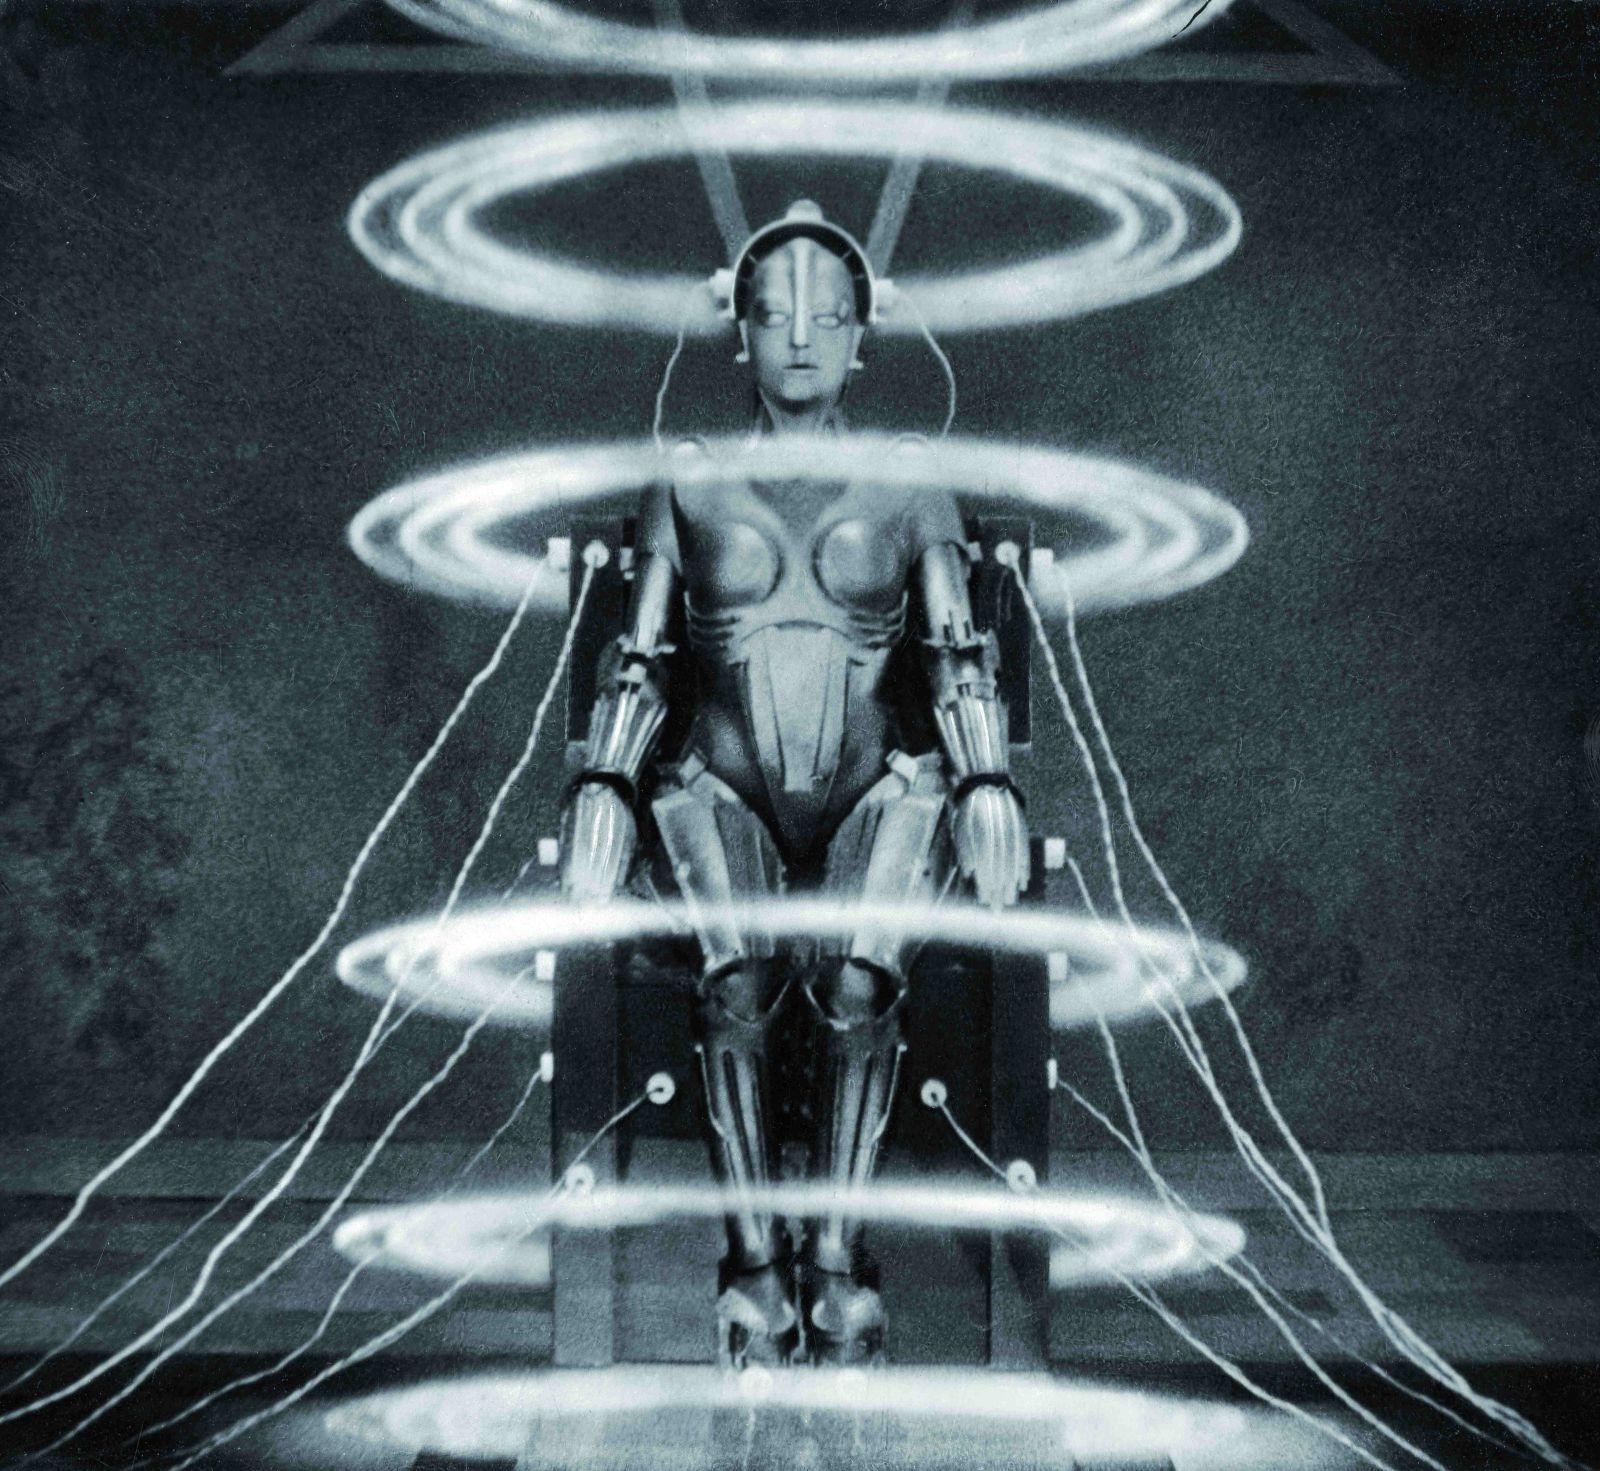 Szenenfoto aus dem Film Metropolis (Deutschland 1927, Regie: Fritz Lang)